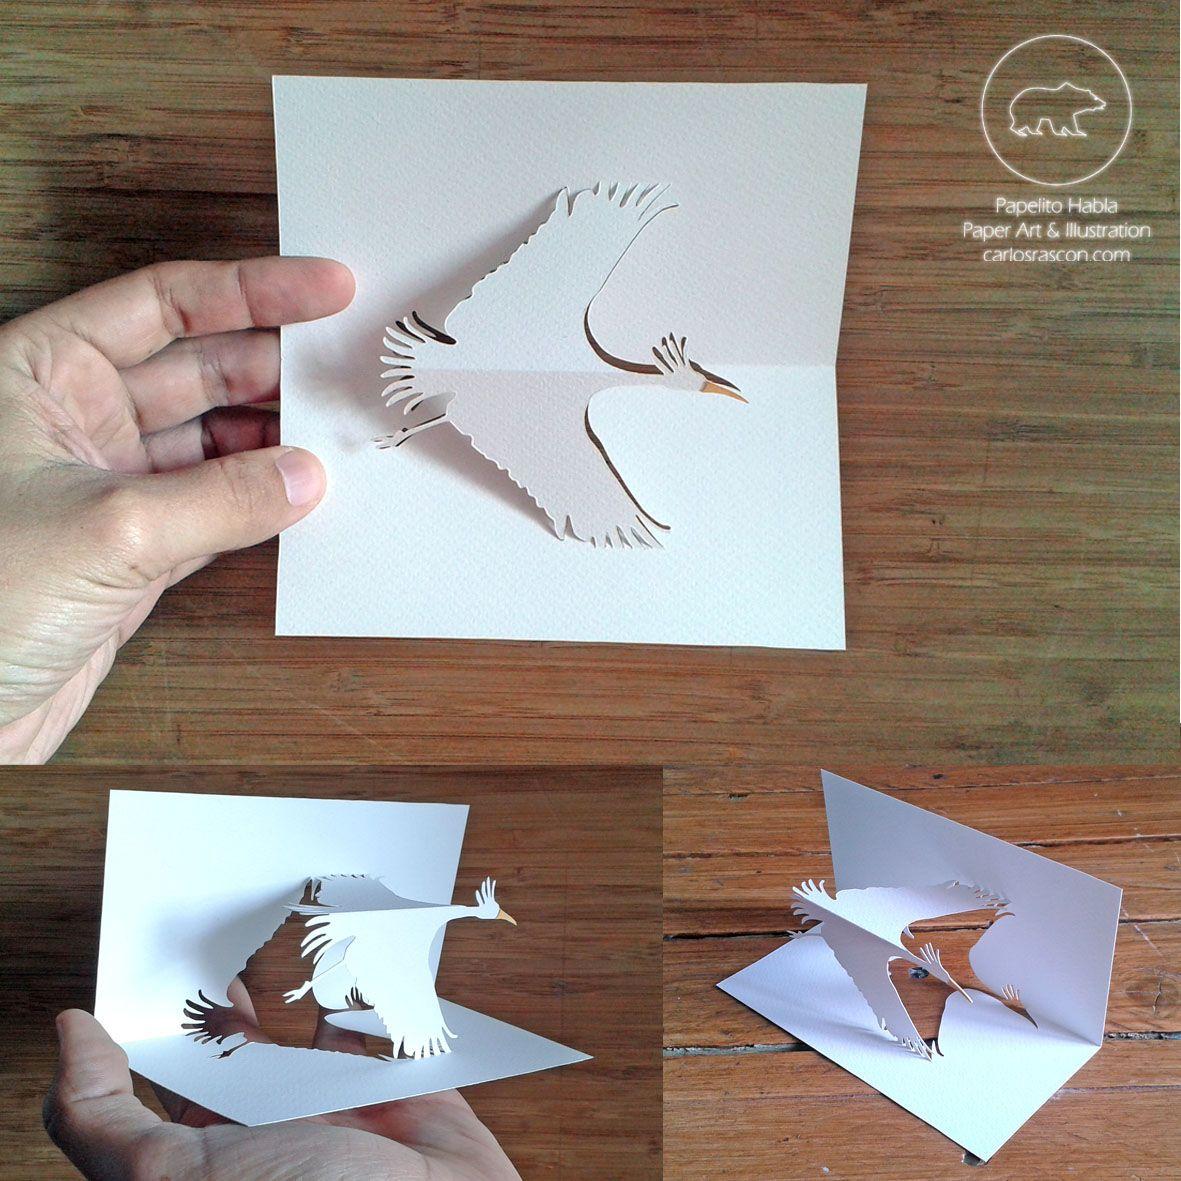 And my first #kirigami piece called The #Flight of the #Crane  Read the whole story http://carlosrascon.com   #papercut #cutpaper #cutout #papercutting #papelpicado #papelcortado #papelcalado #papertallat #arteconpapel #paperart #crane